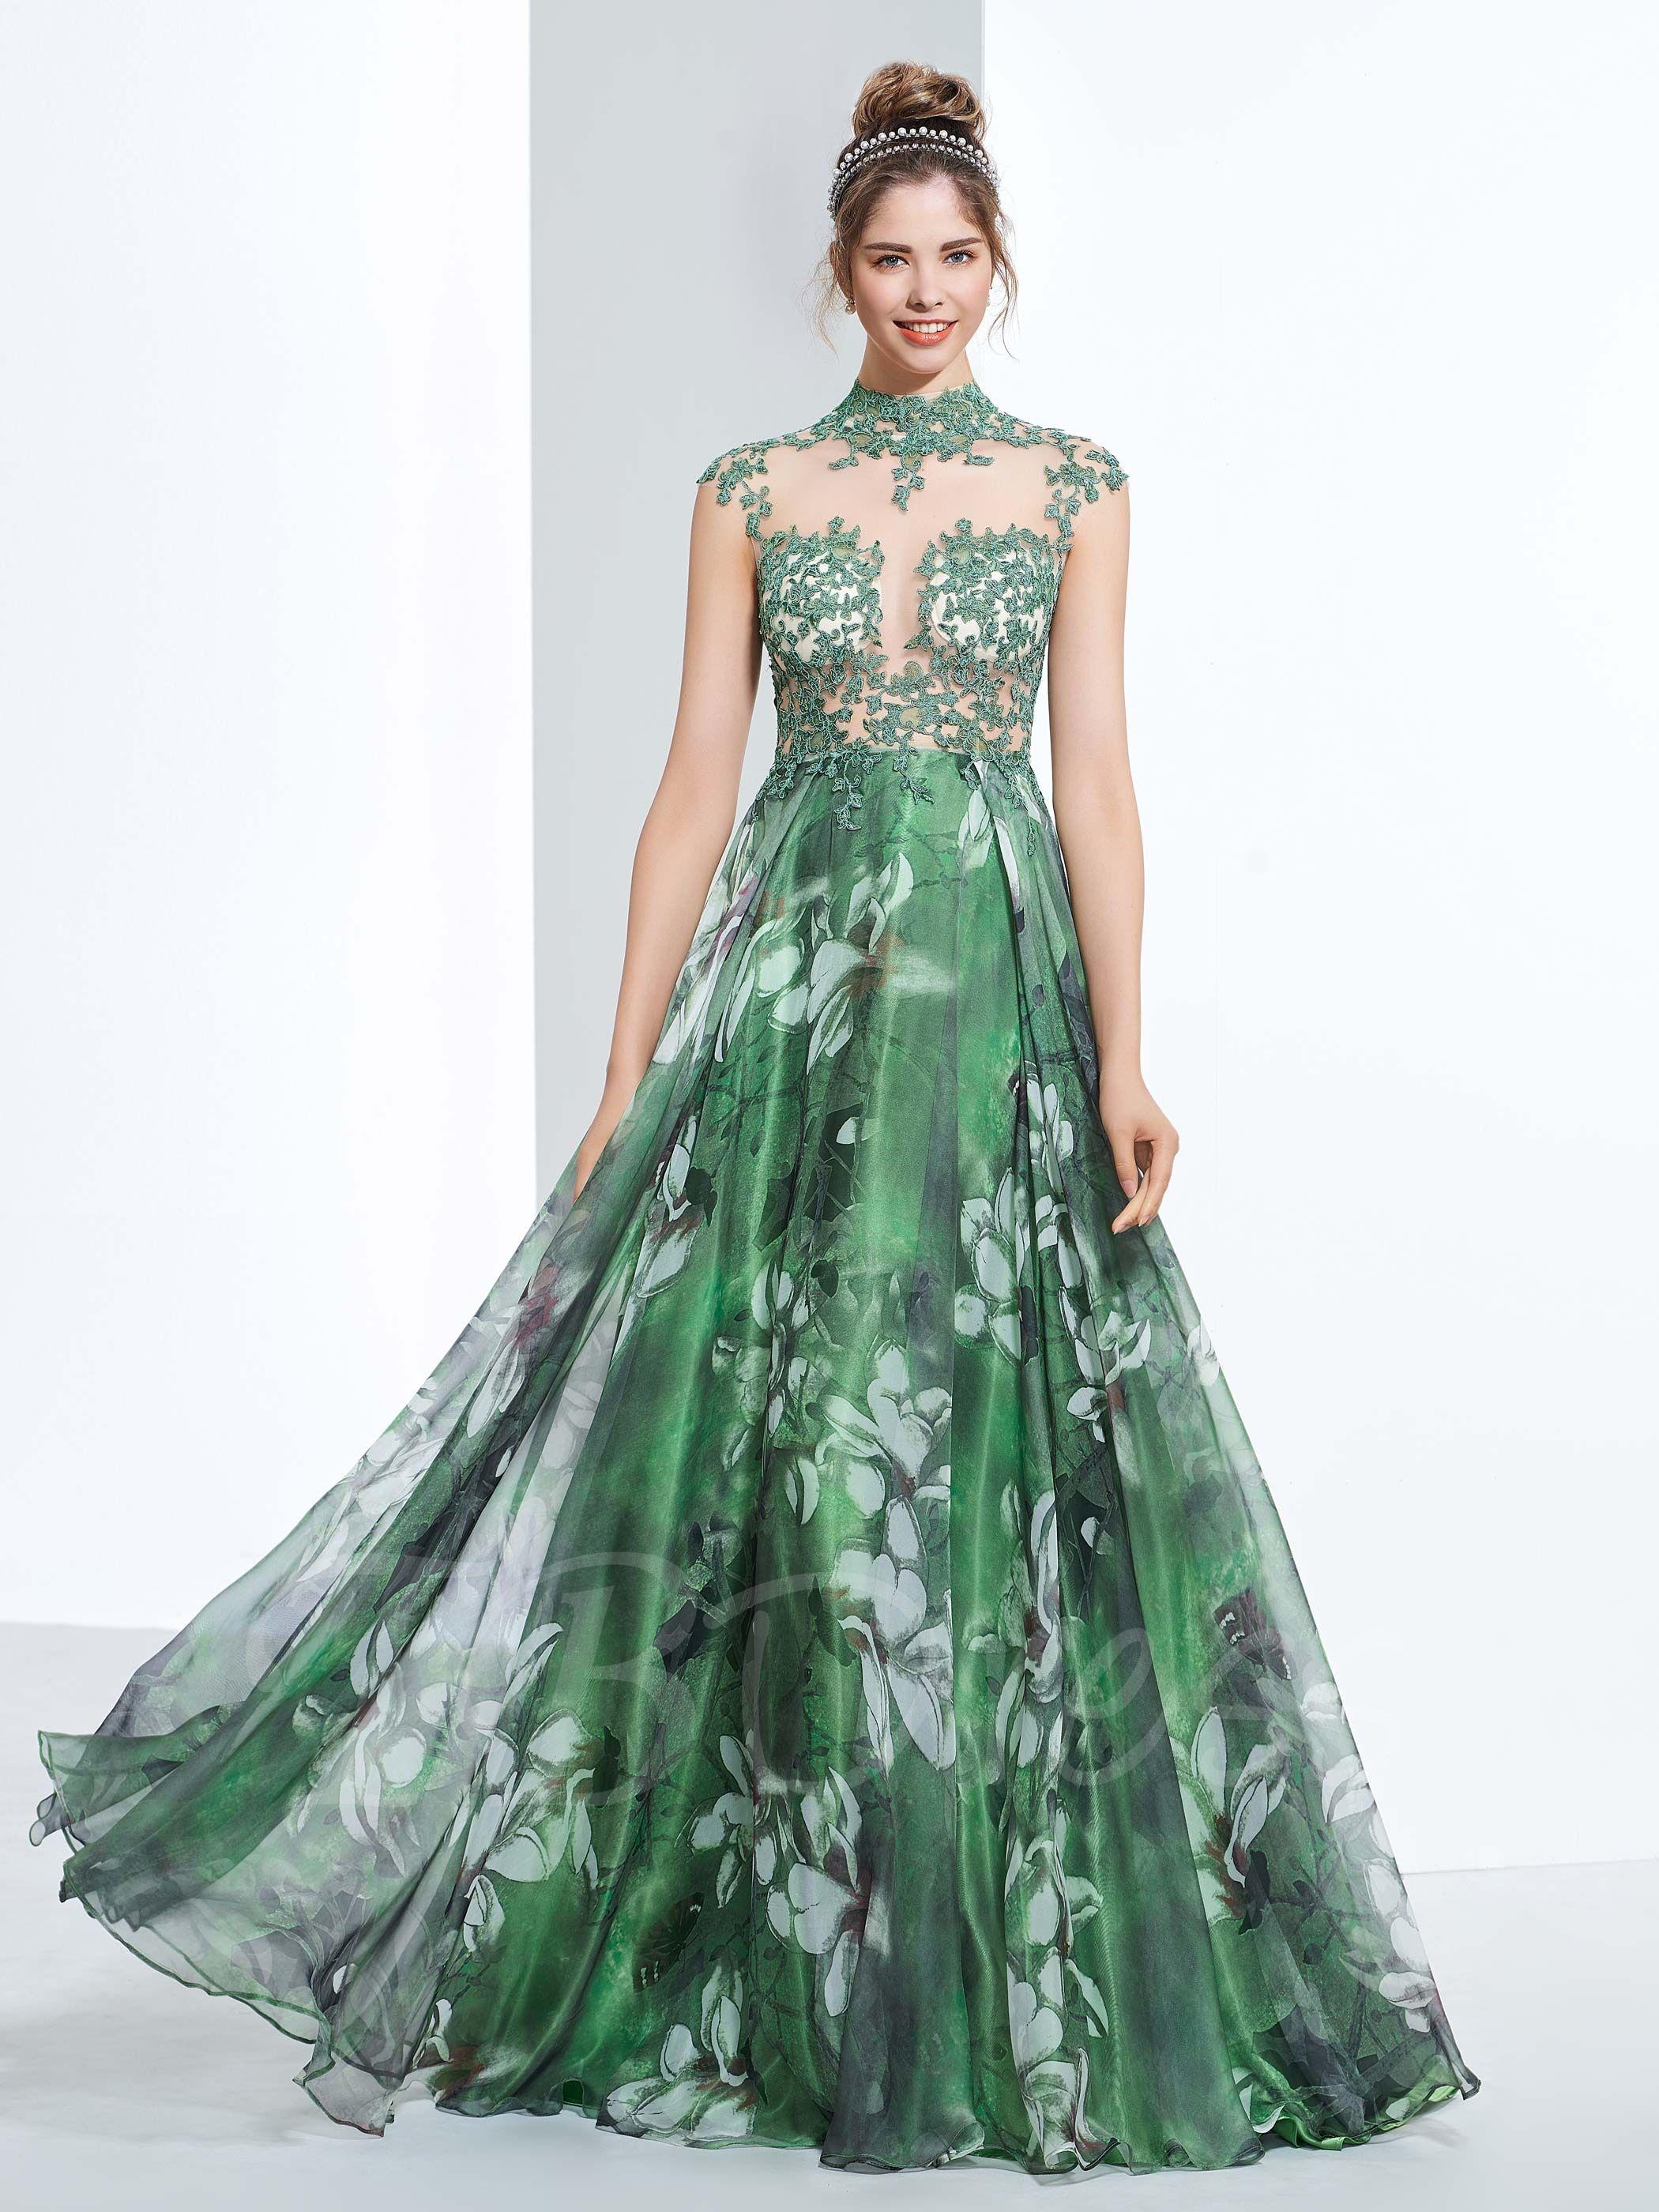 Tbdress Com A Line High Neck Cap Sleeves Appliques Button Printed Prom Dress 132 99